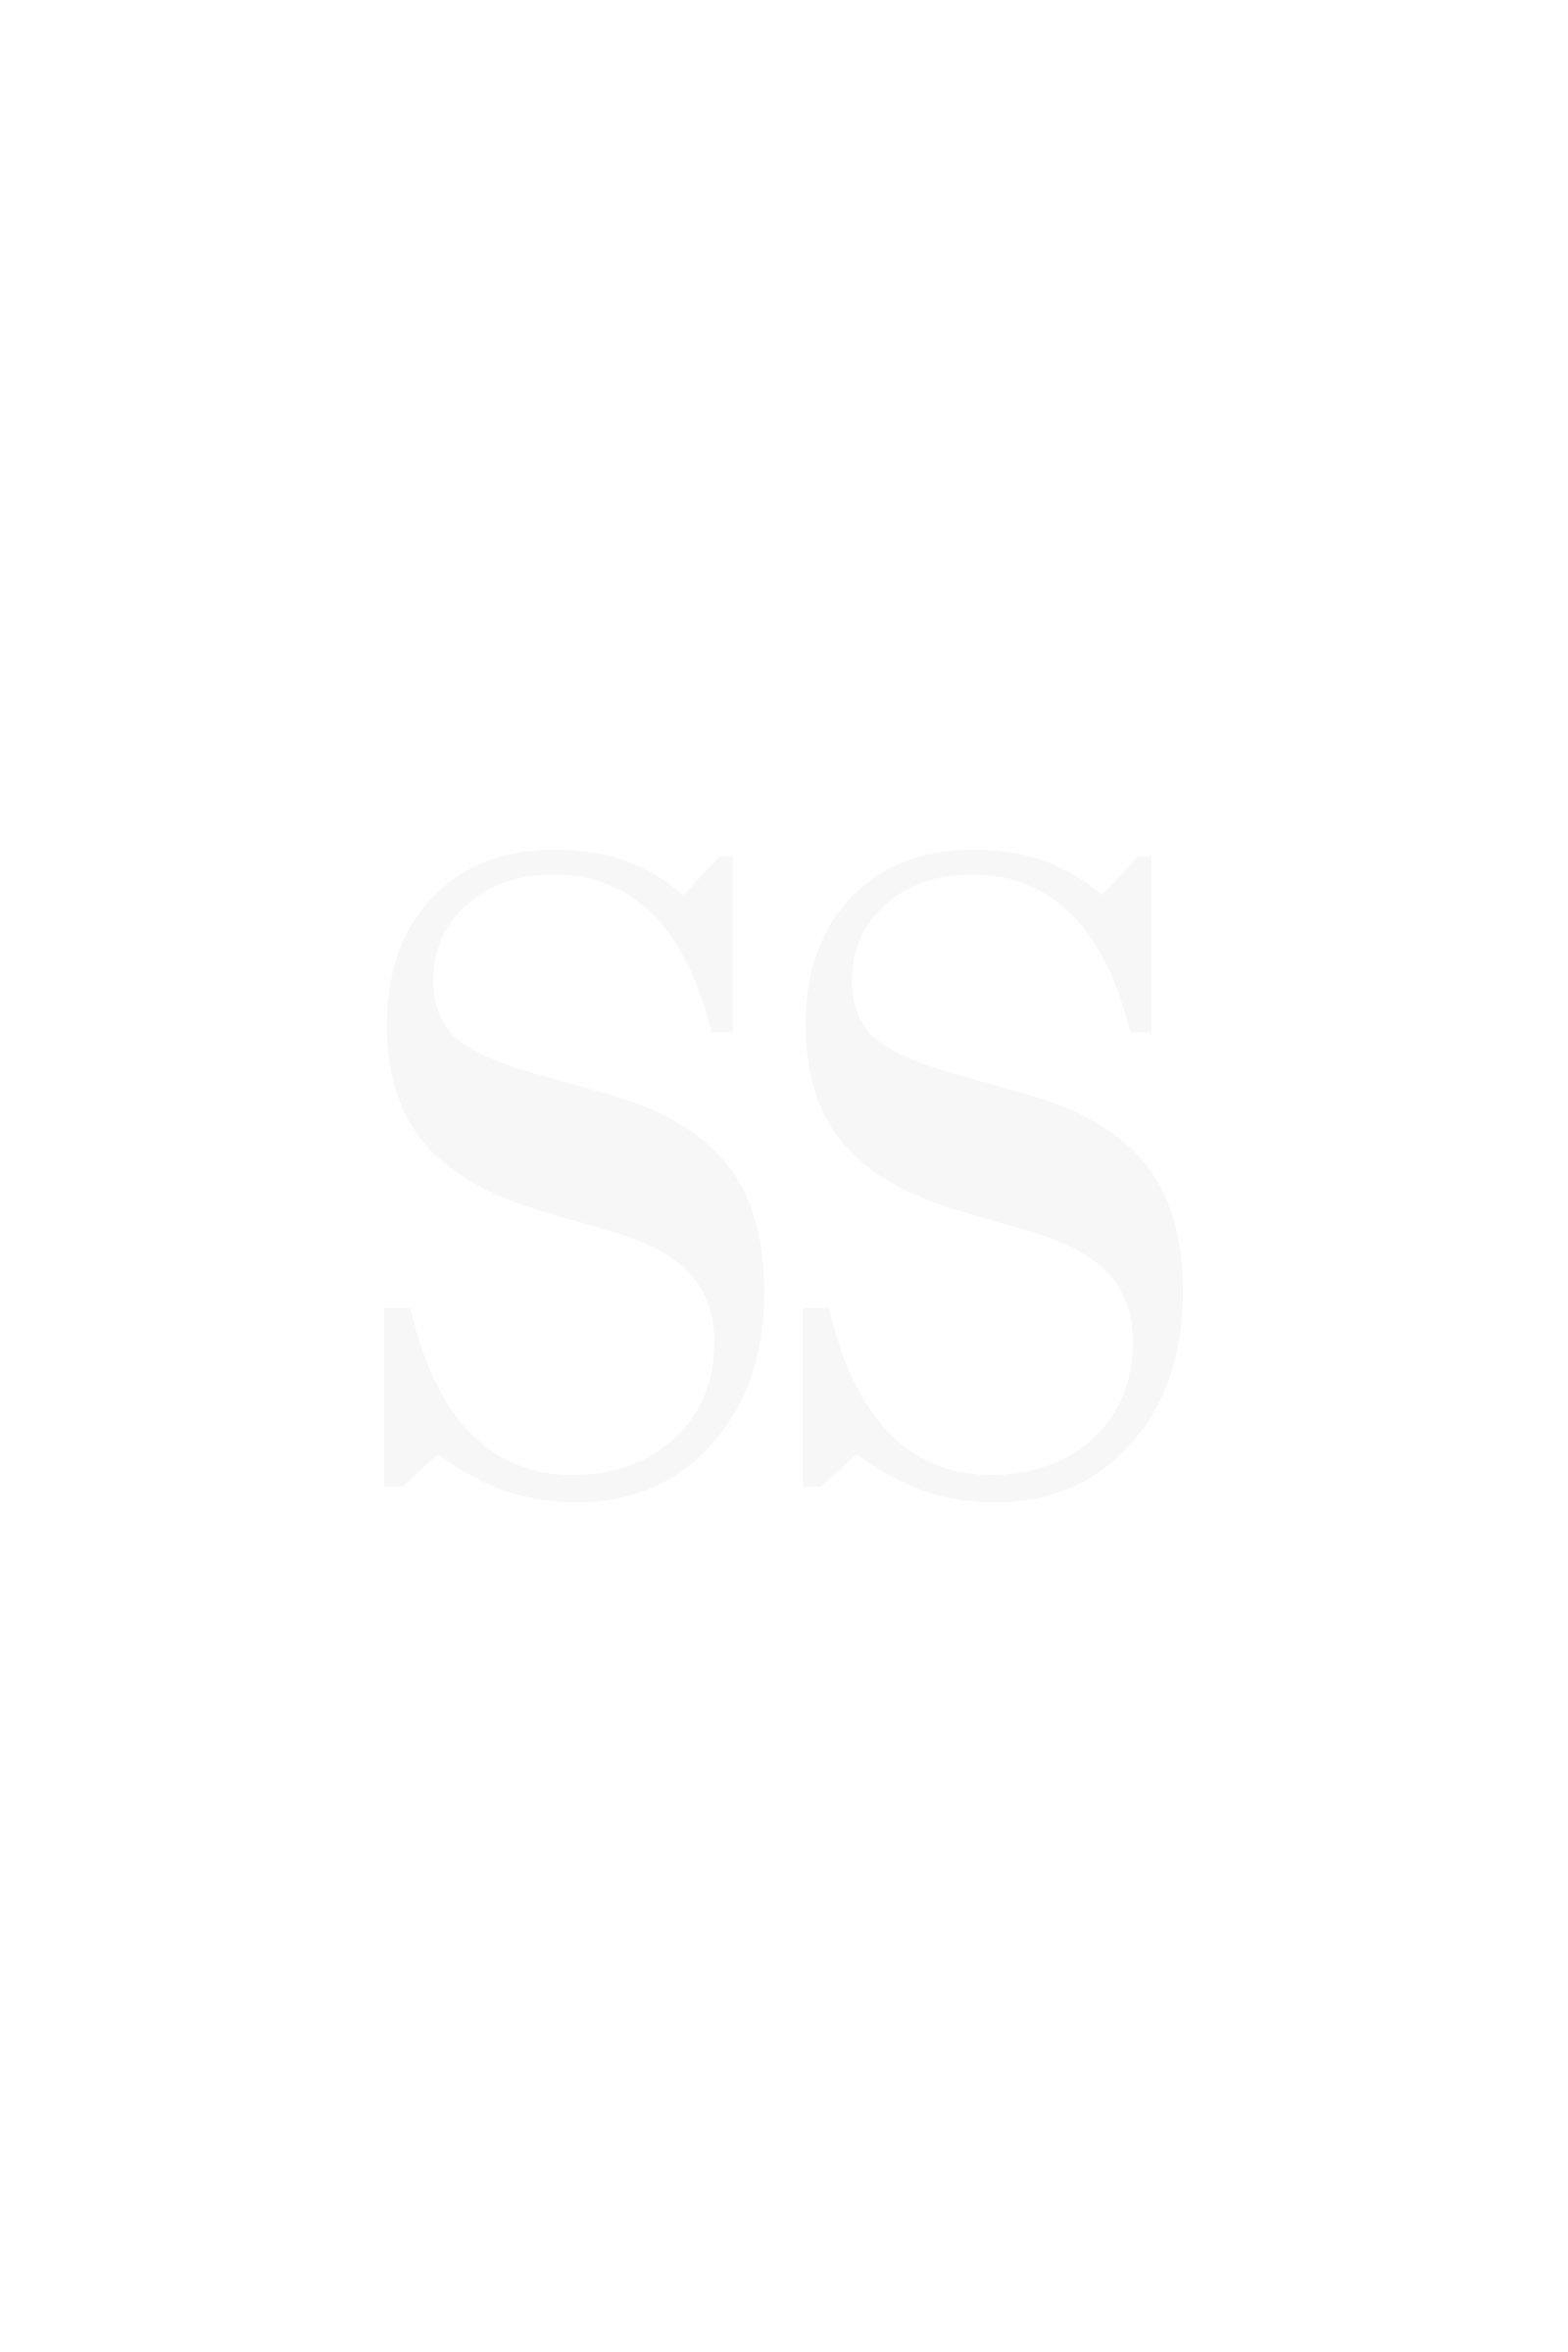 Sana Safinaz Online Design # 001B